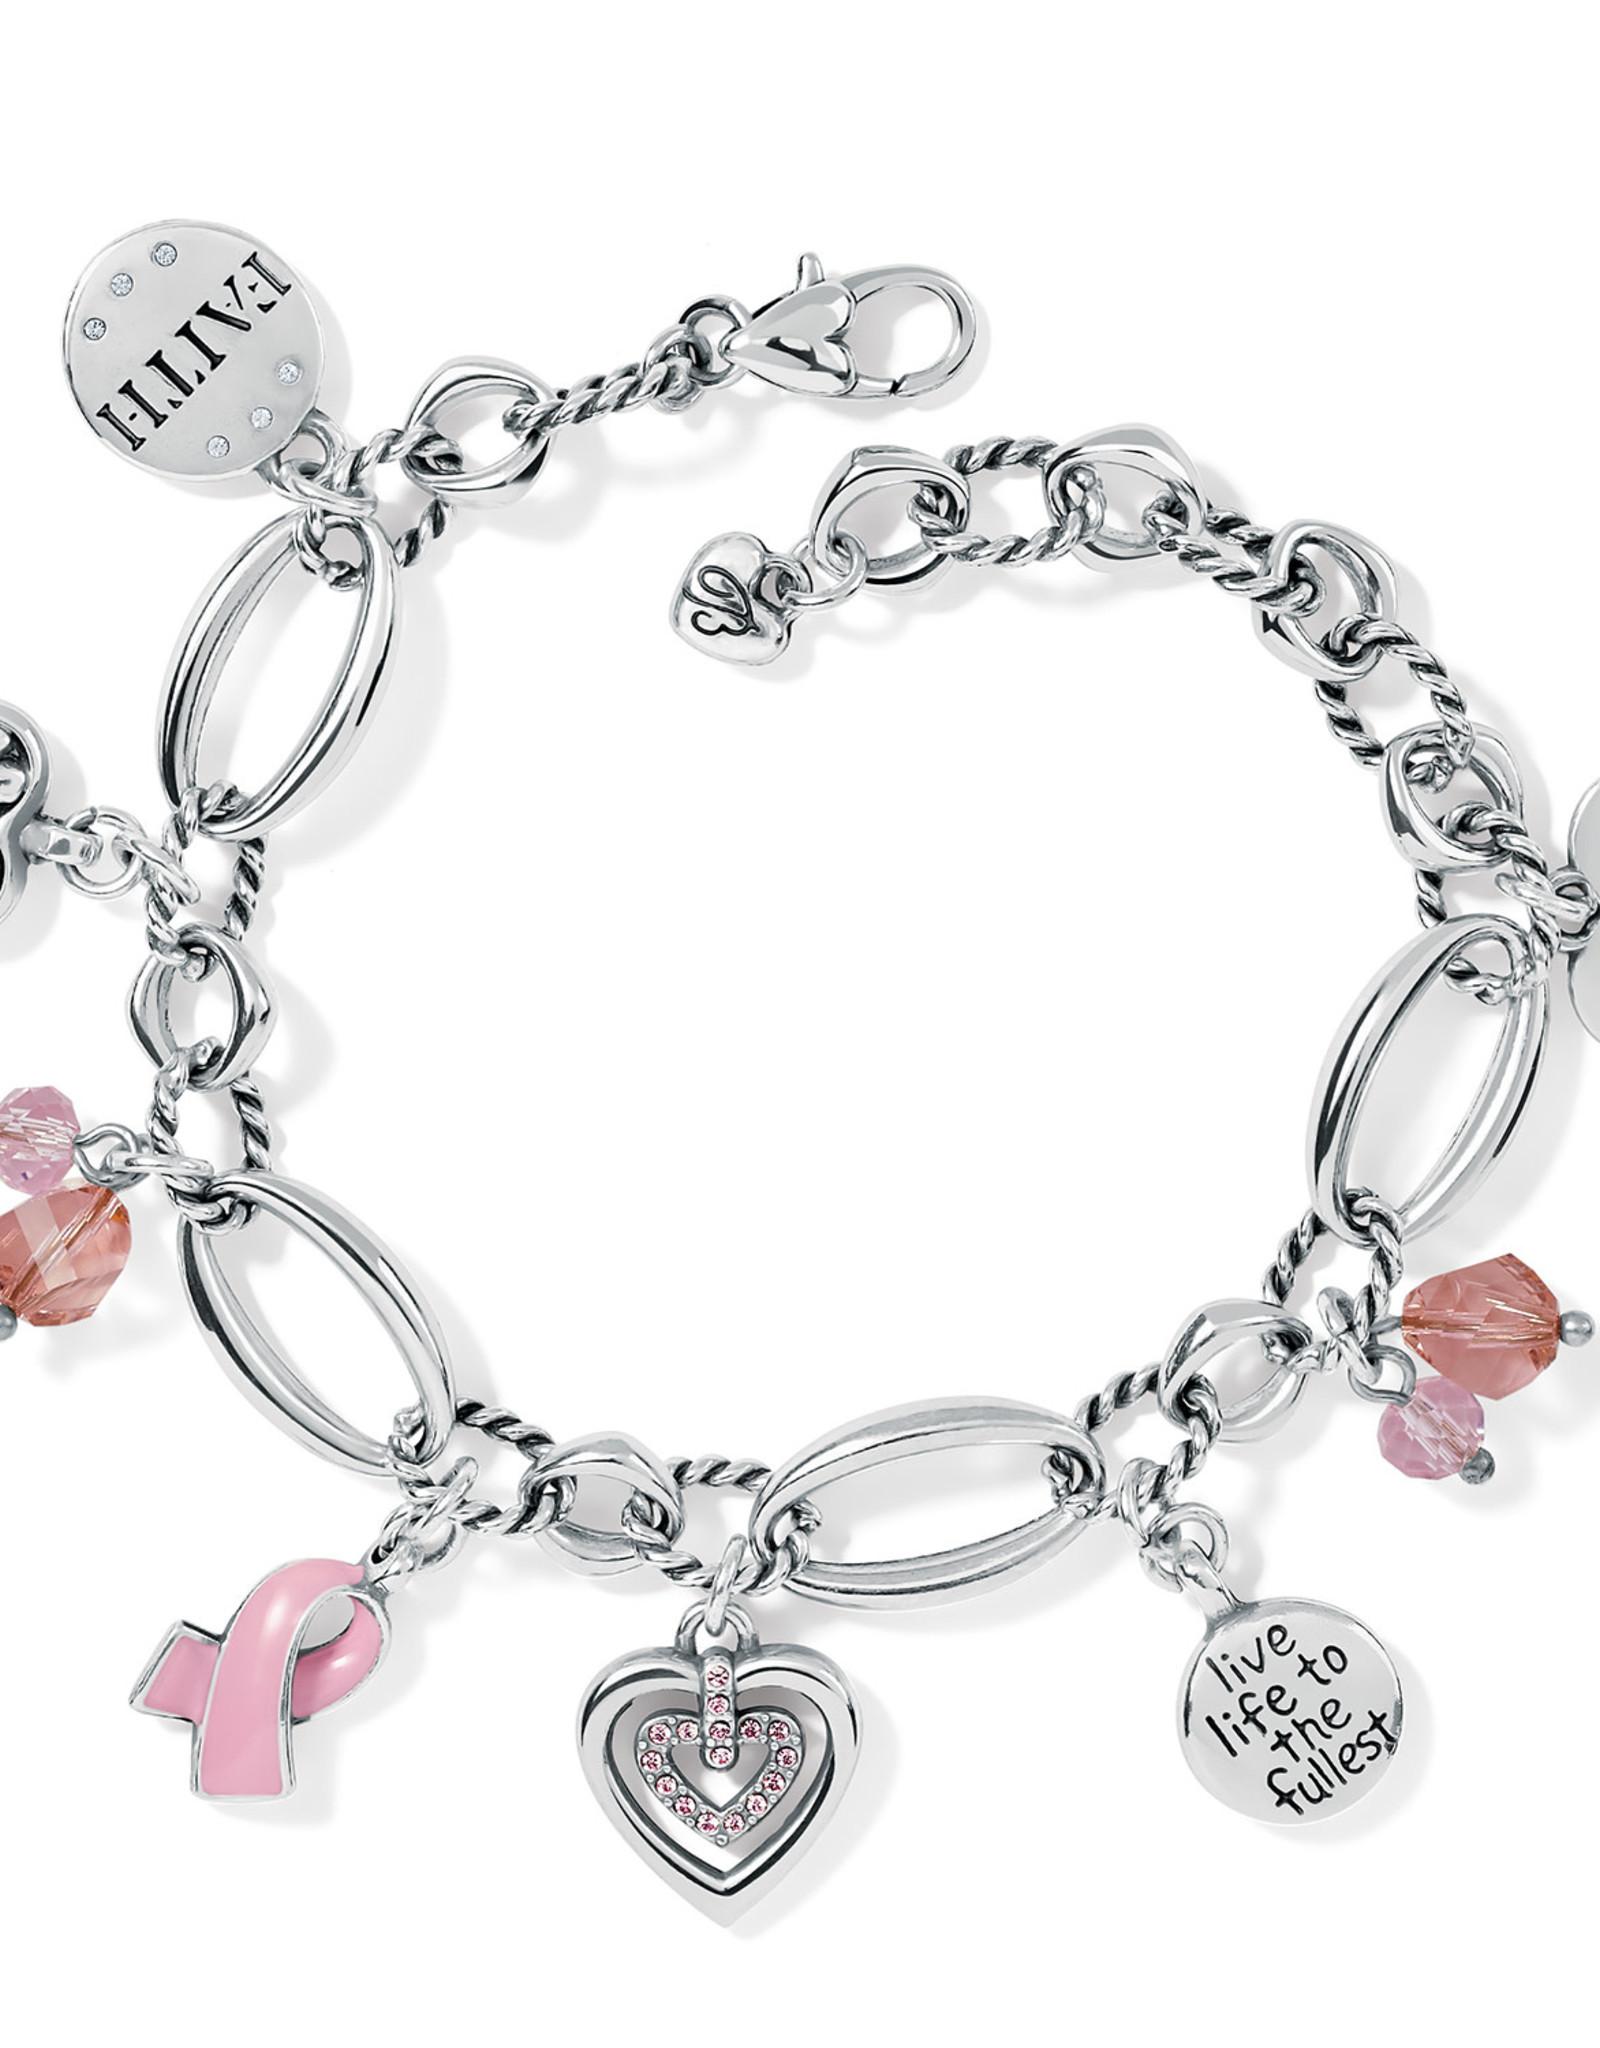 MudPie Brighton Power of Pink Bracelet 2021